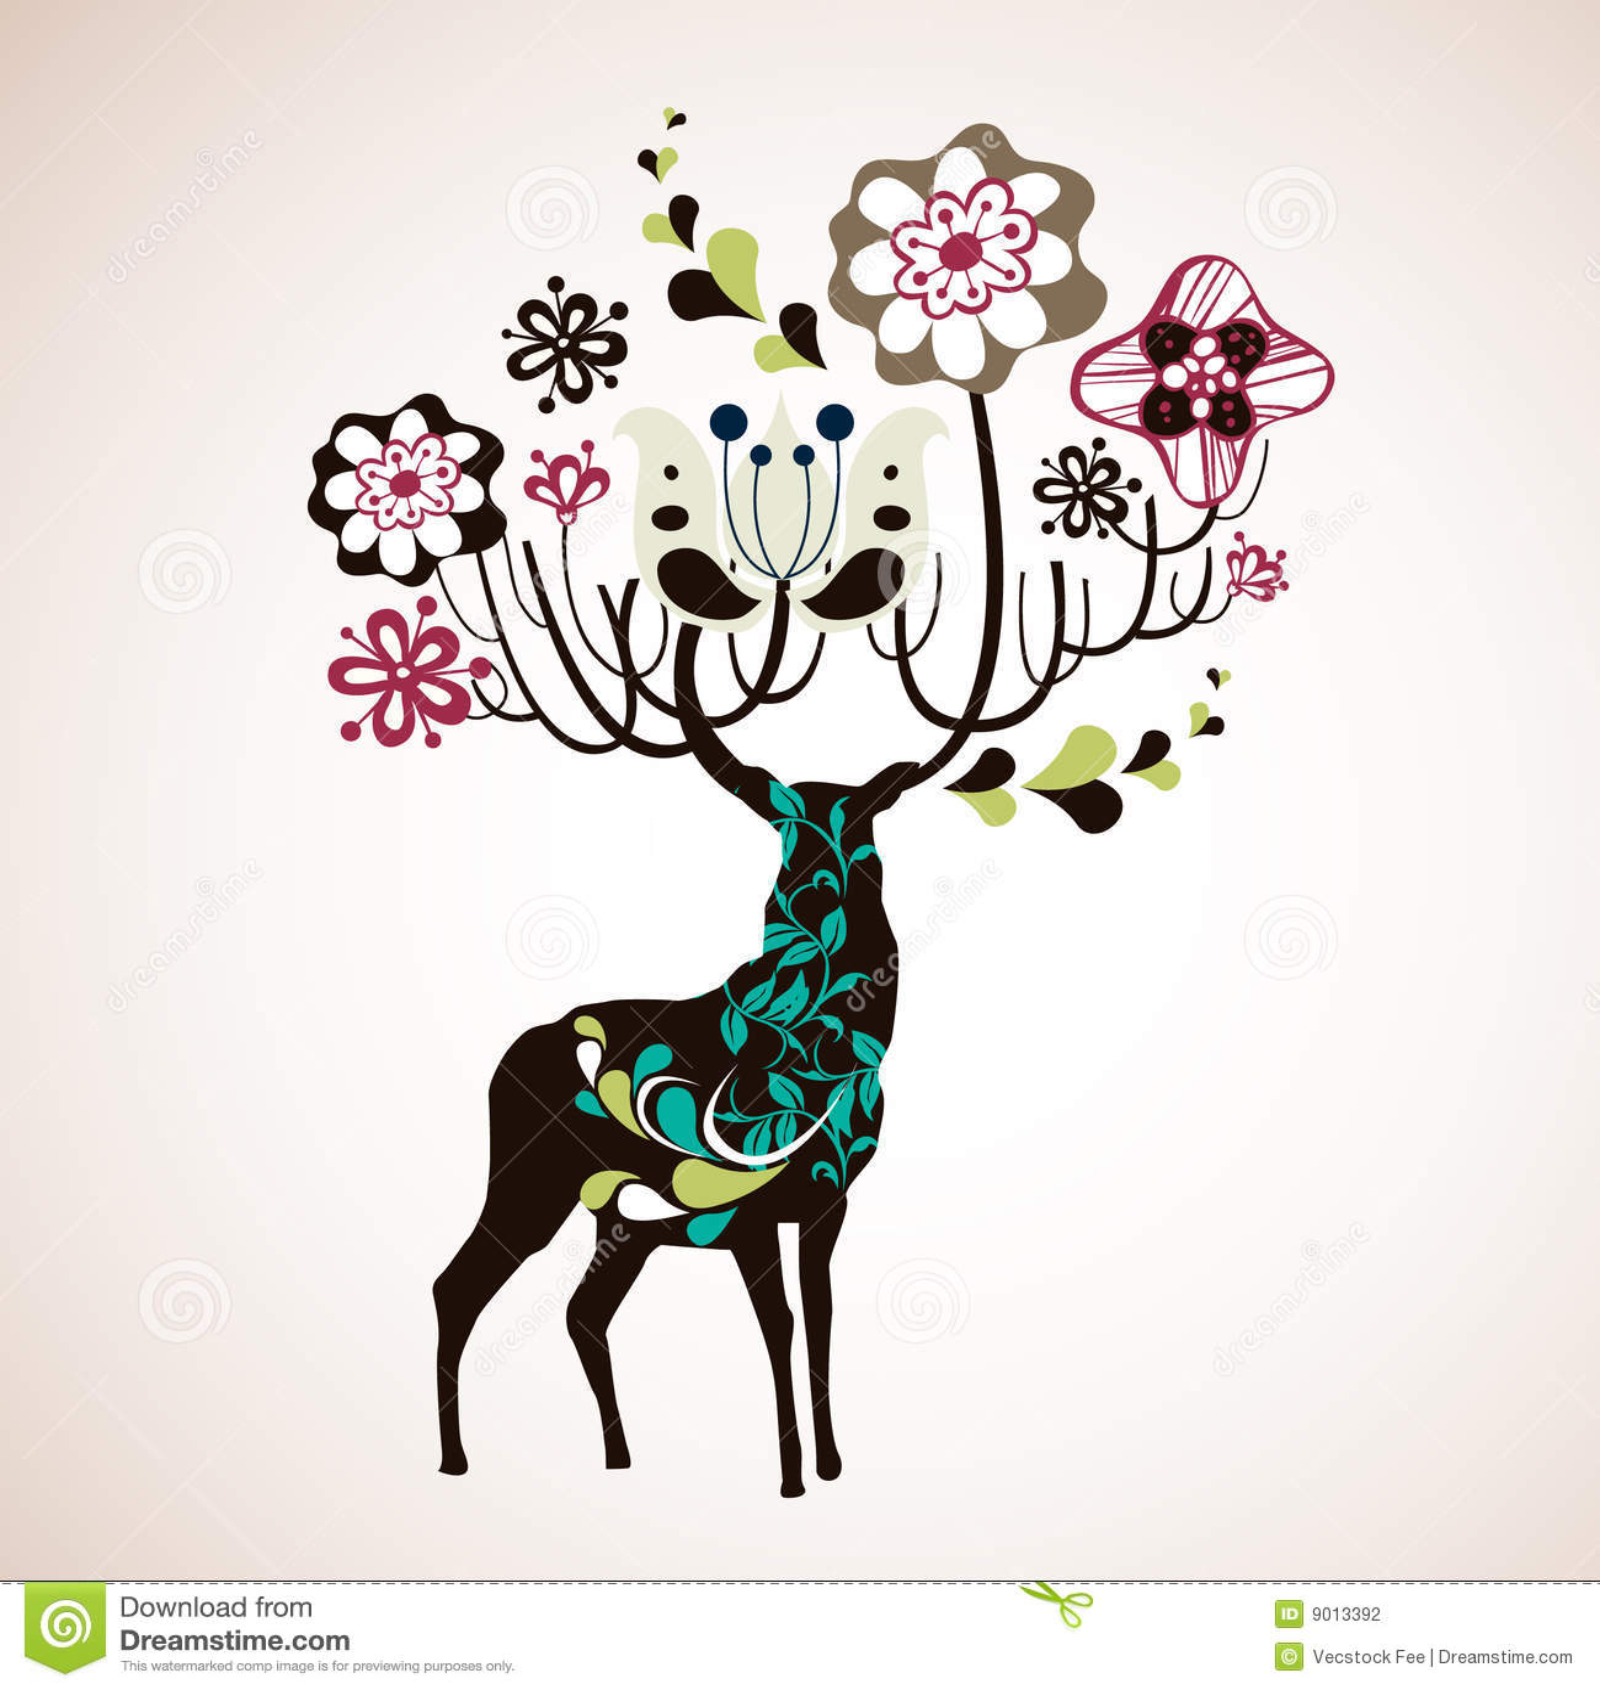 Cute Merry Christmas Wallpaper Backgrounds Reindeer Wallpaper Stock Vector Image Of Animal